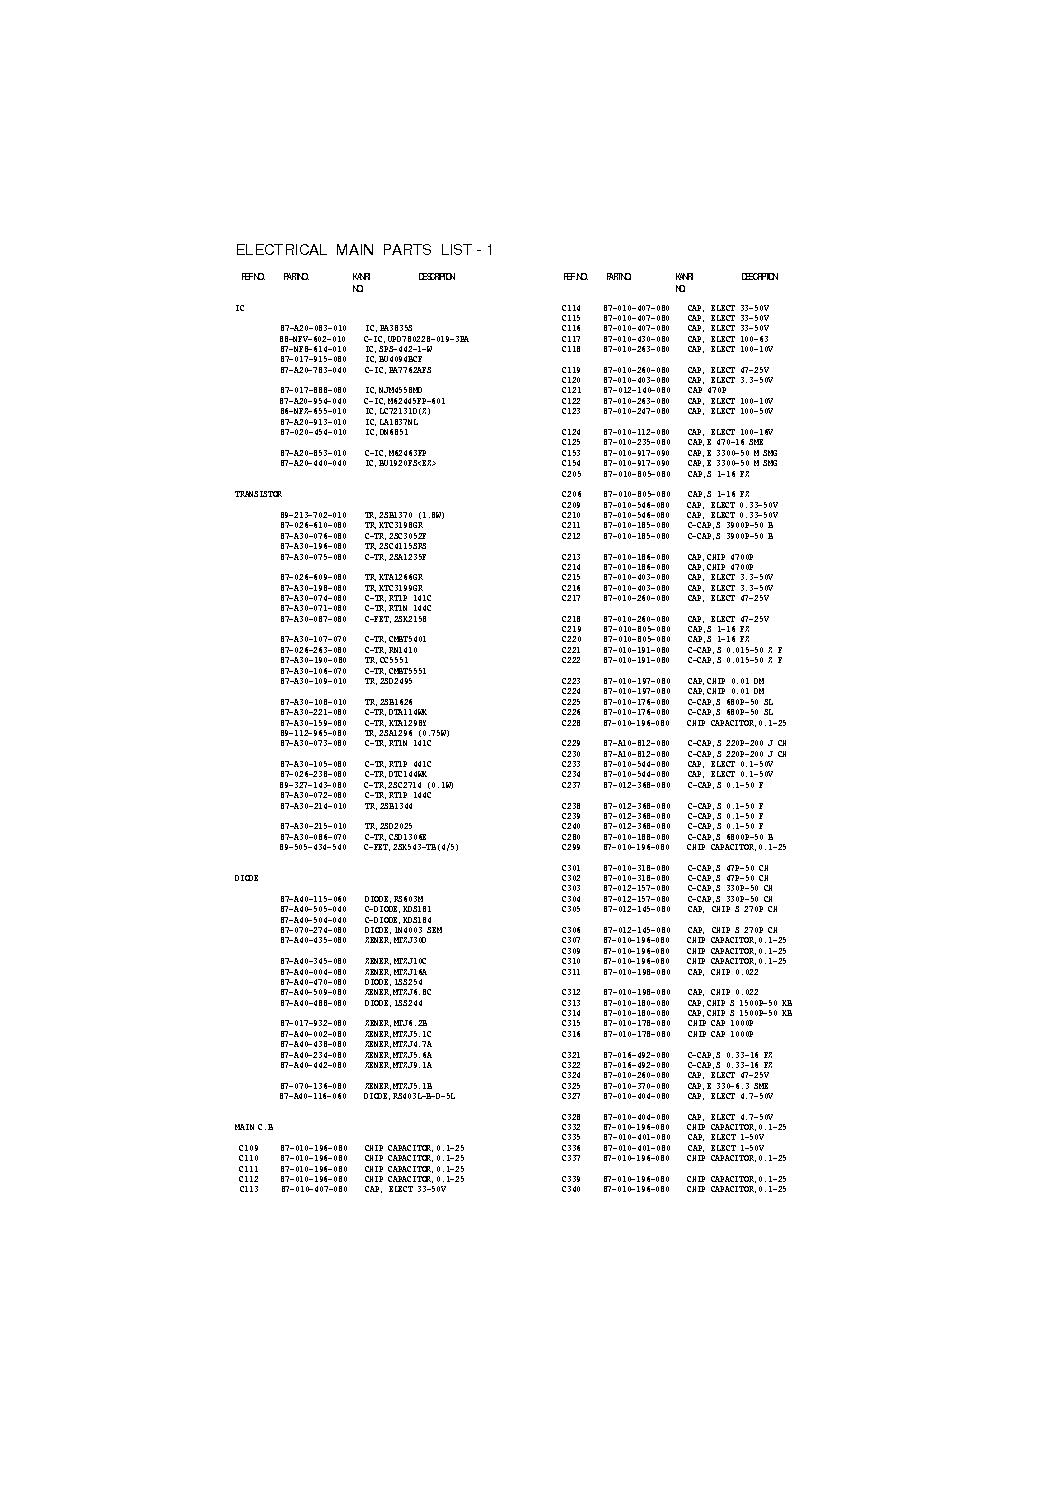 AIWA NSX-AV320 PARTS SCH Service Manual download